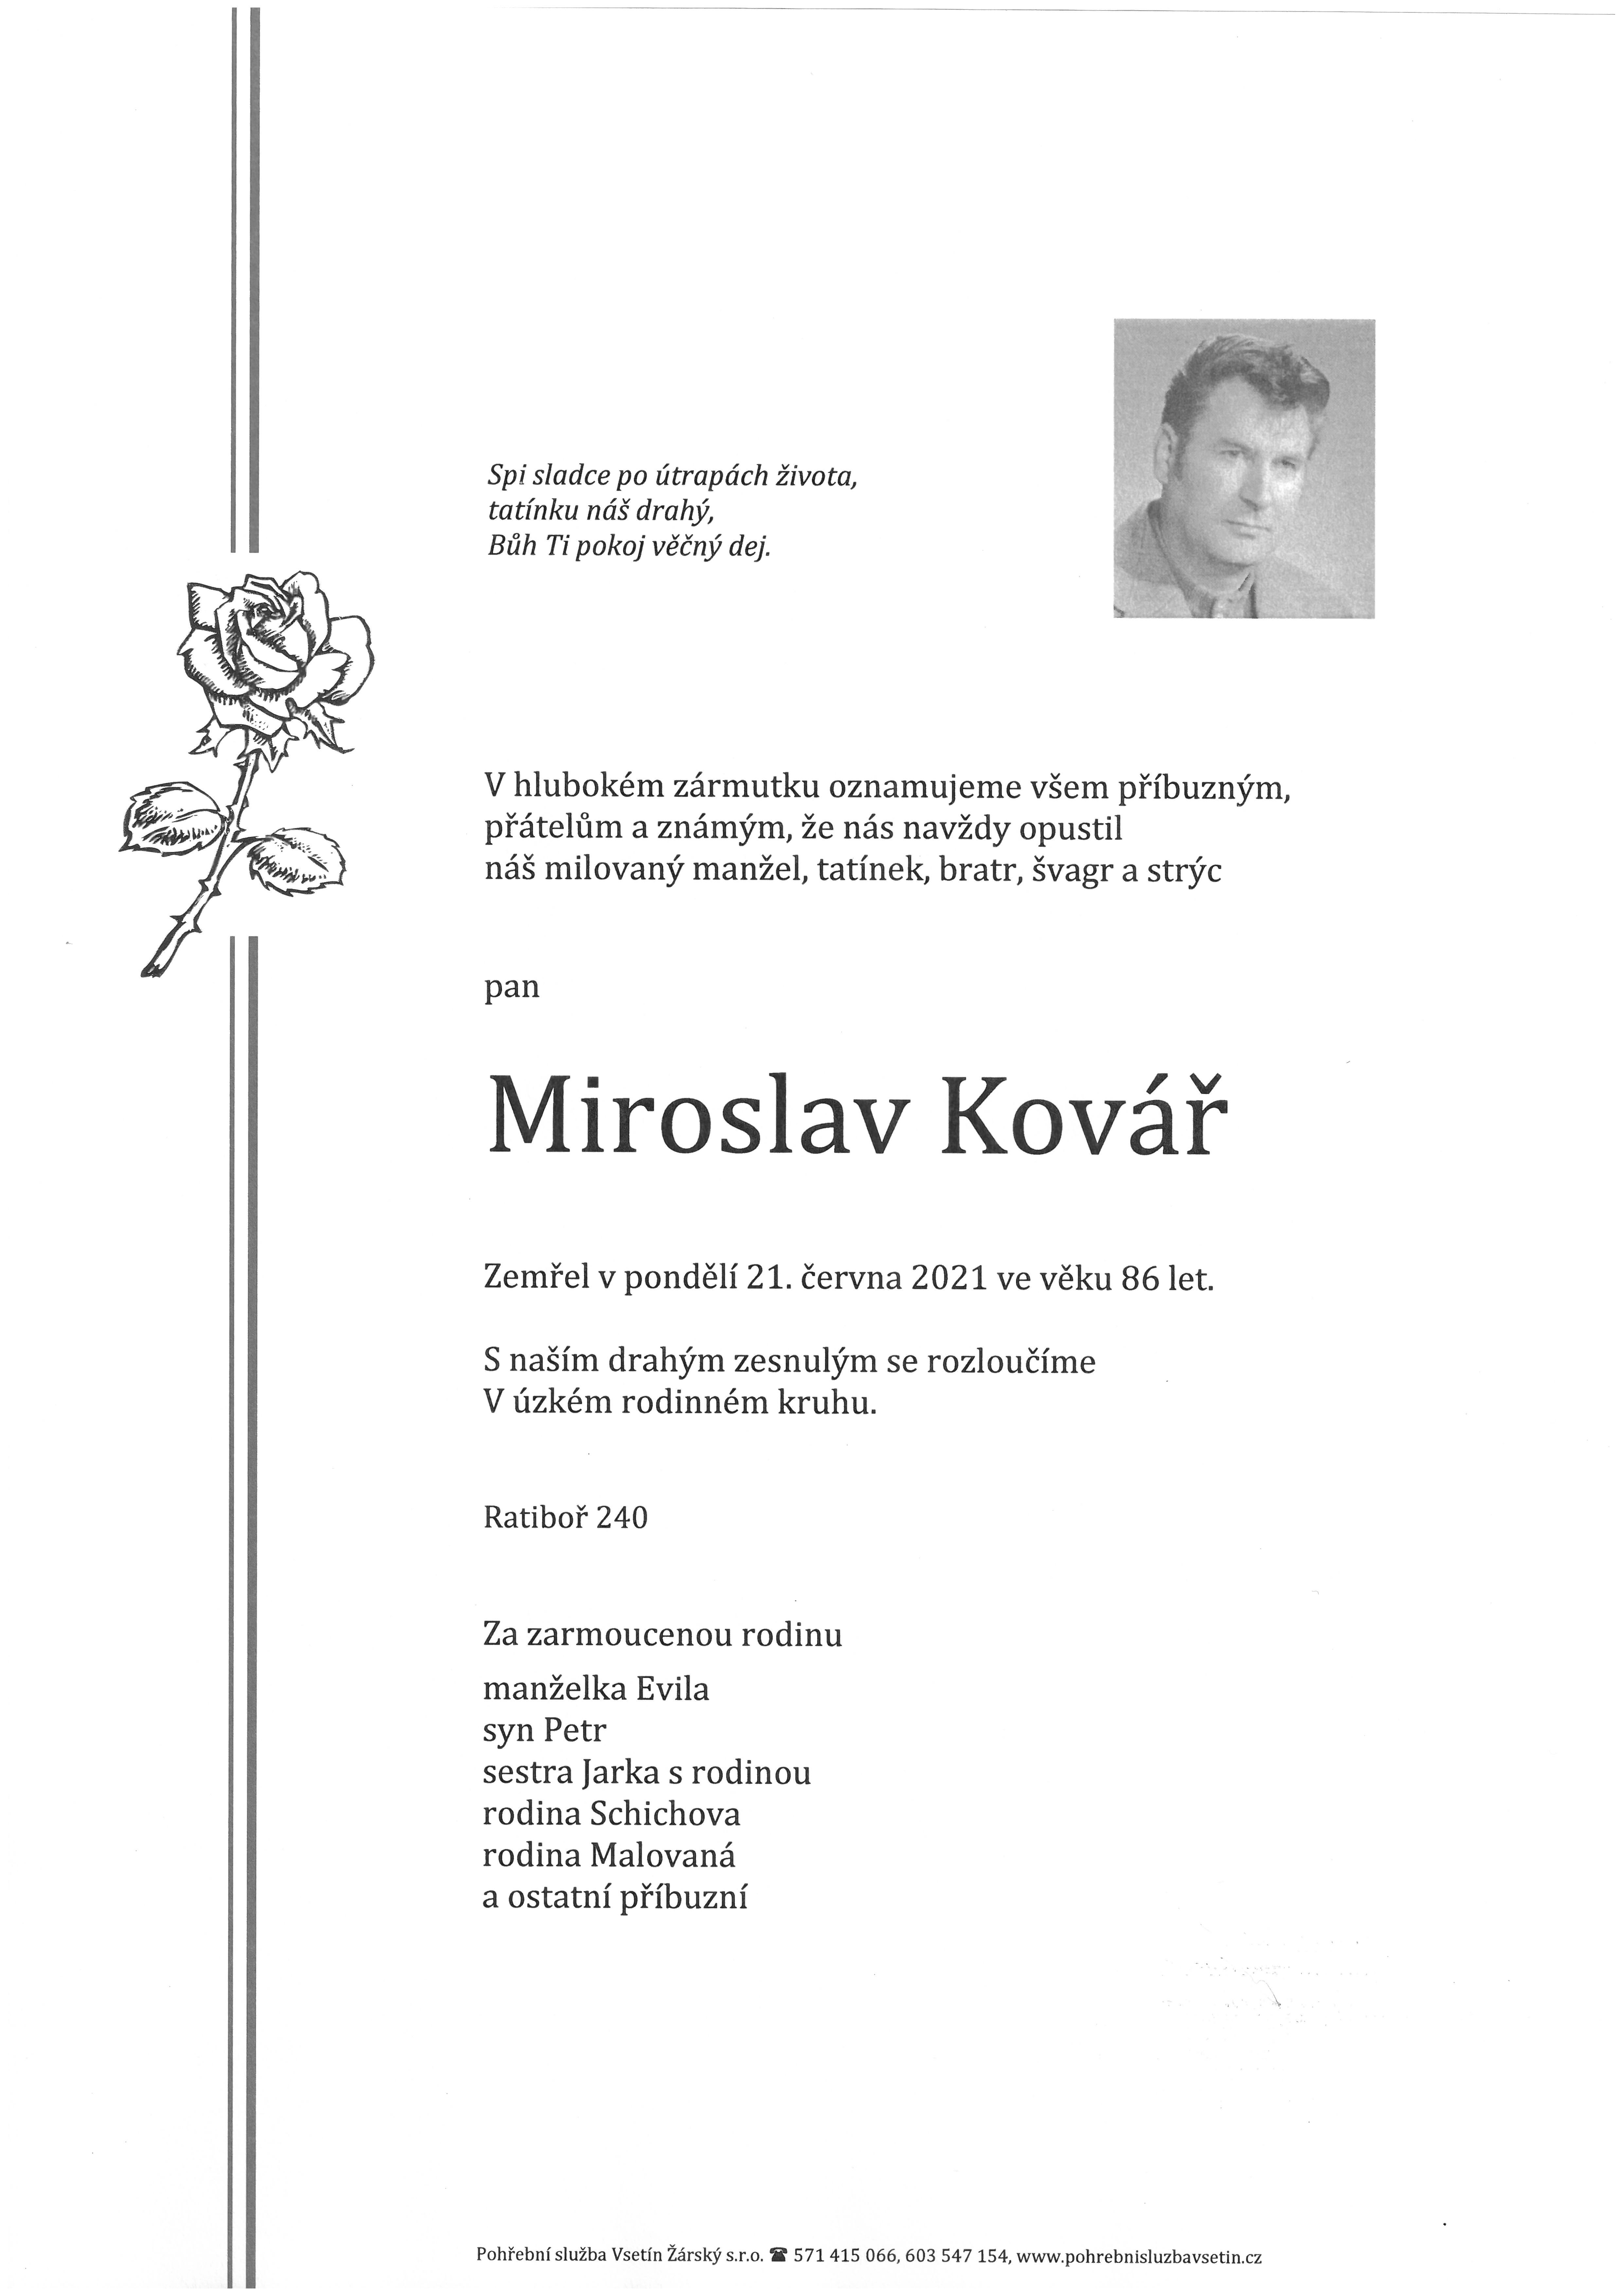 Miroslav Kovář